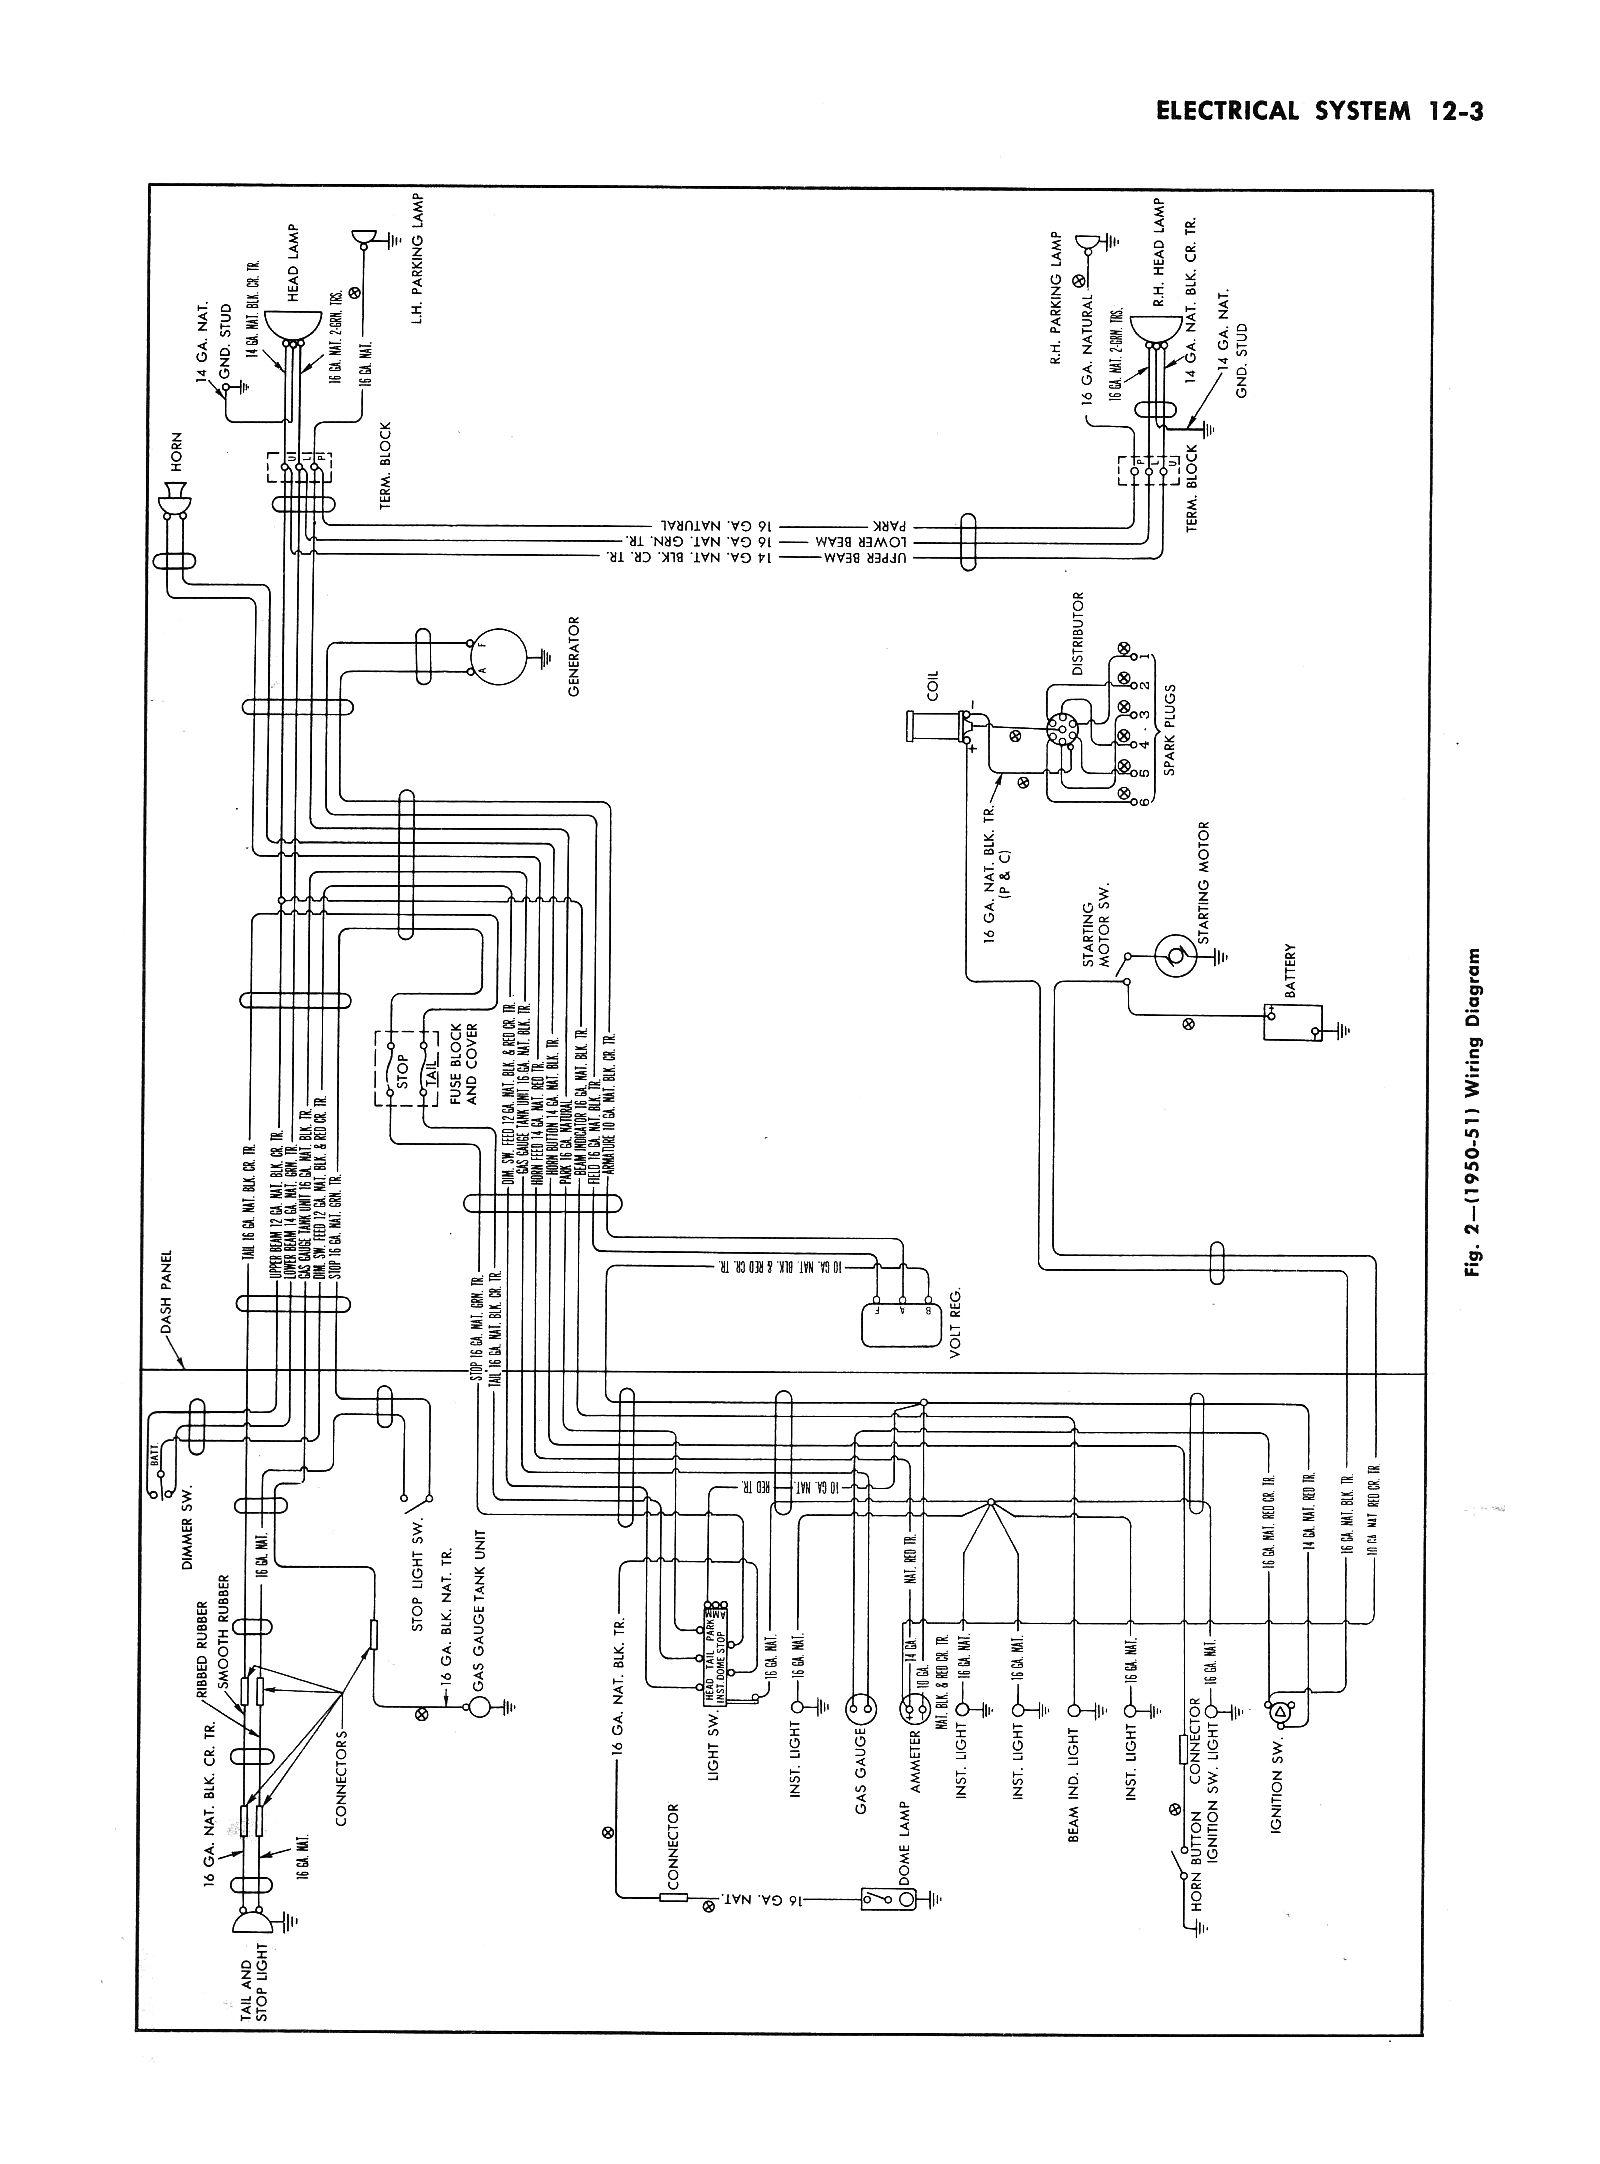 Pleasant C R Panel Wiring Diagram Wiring Library Wiring Cloud Xortanetembamohammedshrineorg